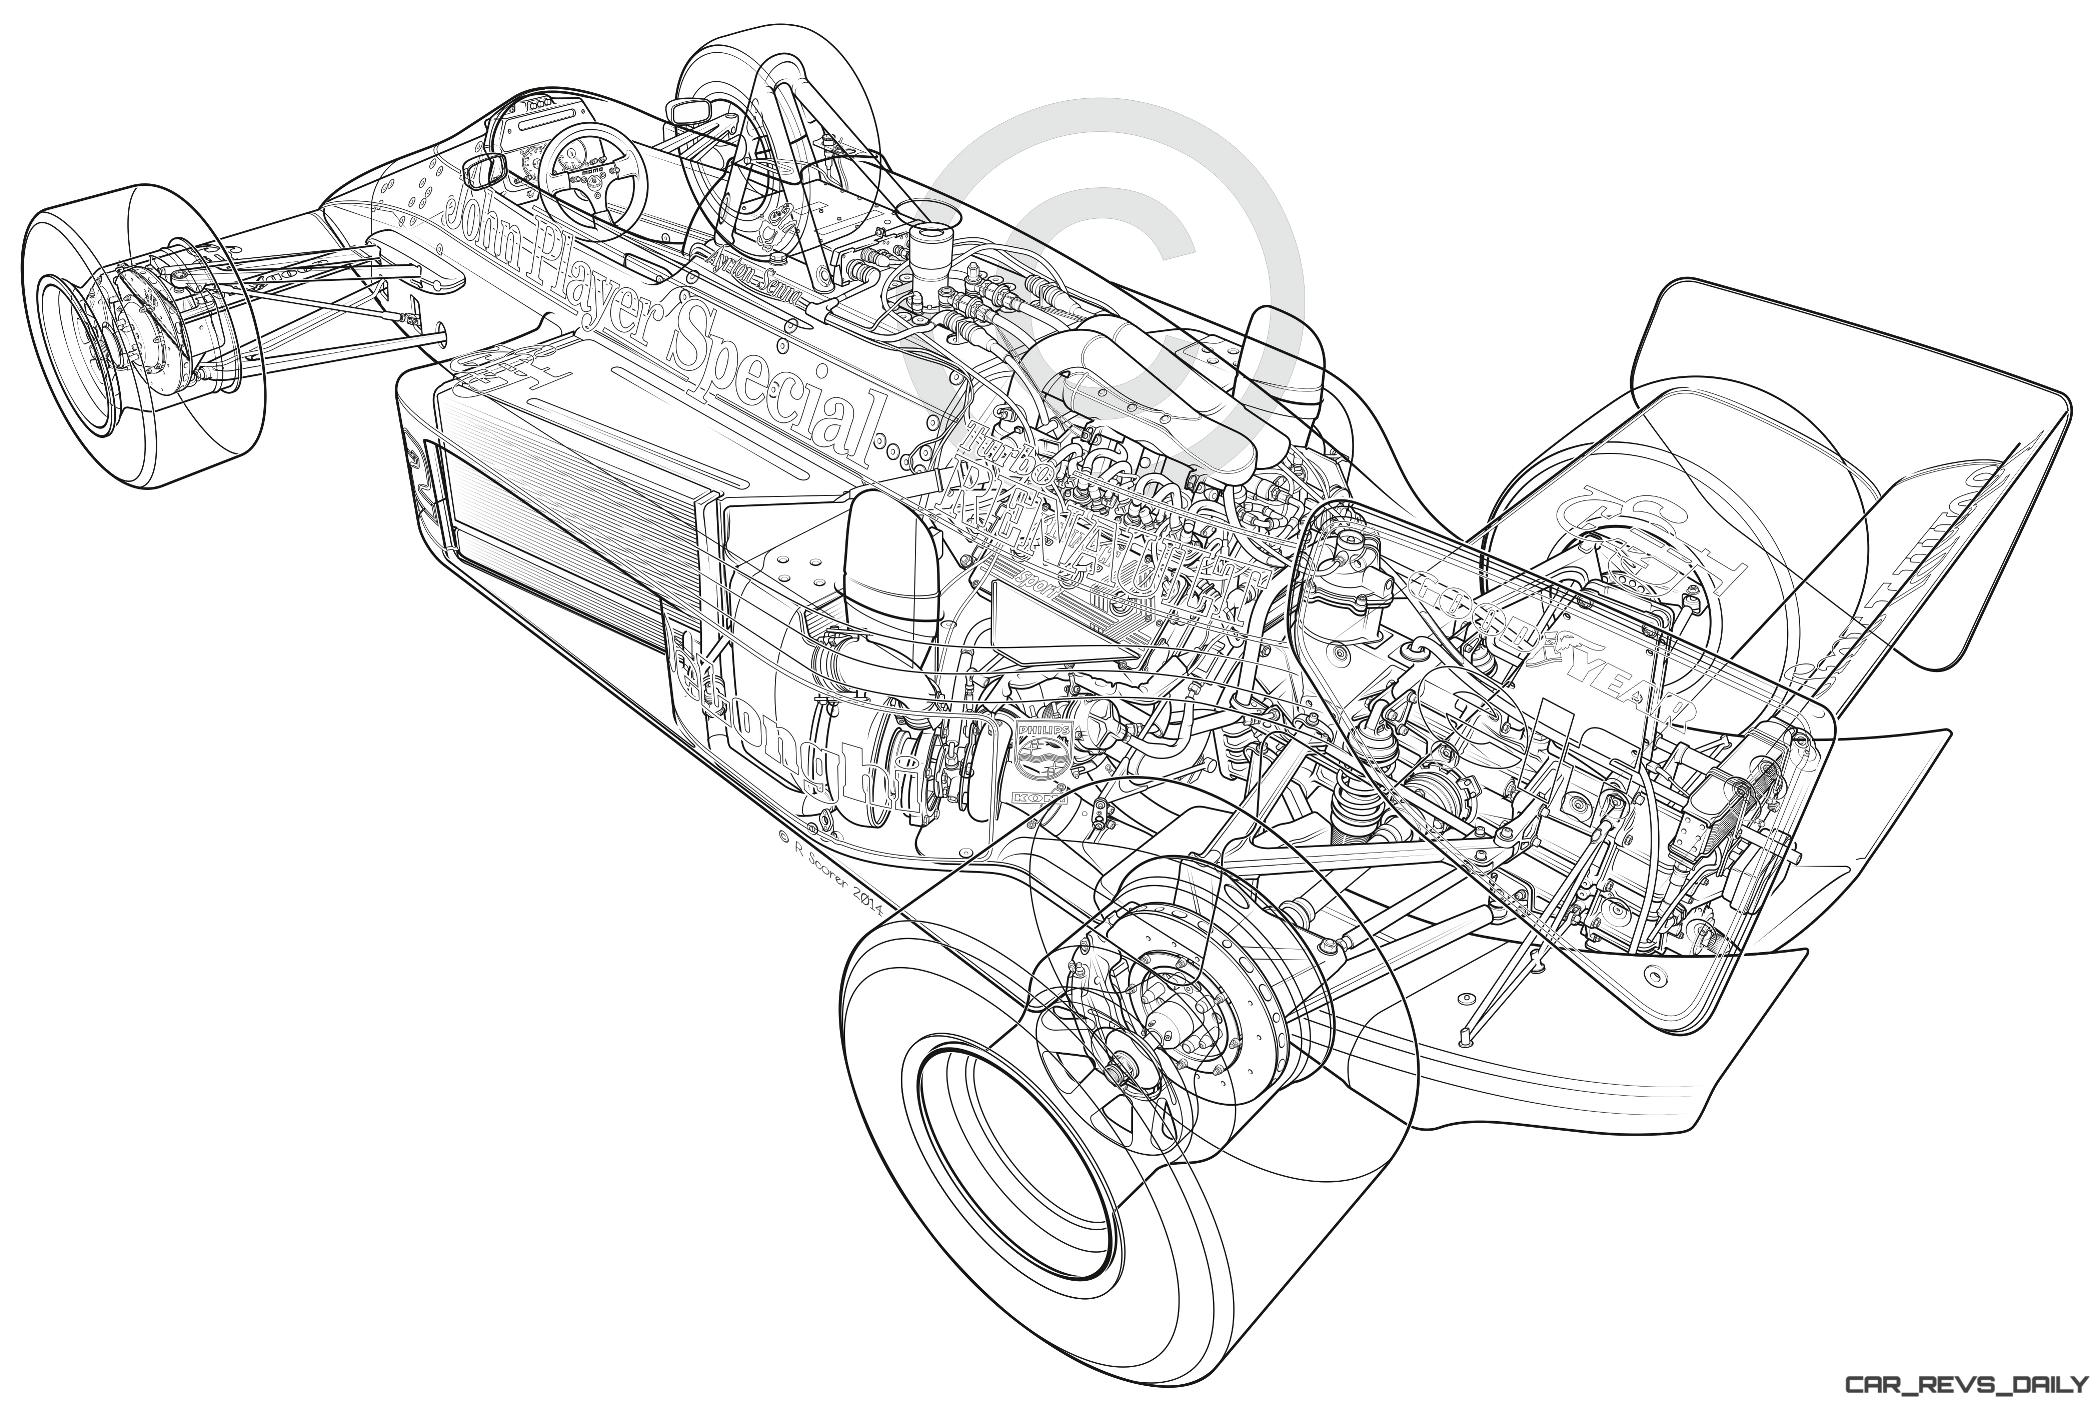 Lotus 98t 3 F1 Car Of Ayrton Senna